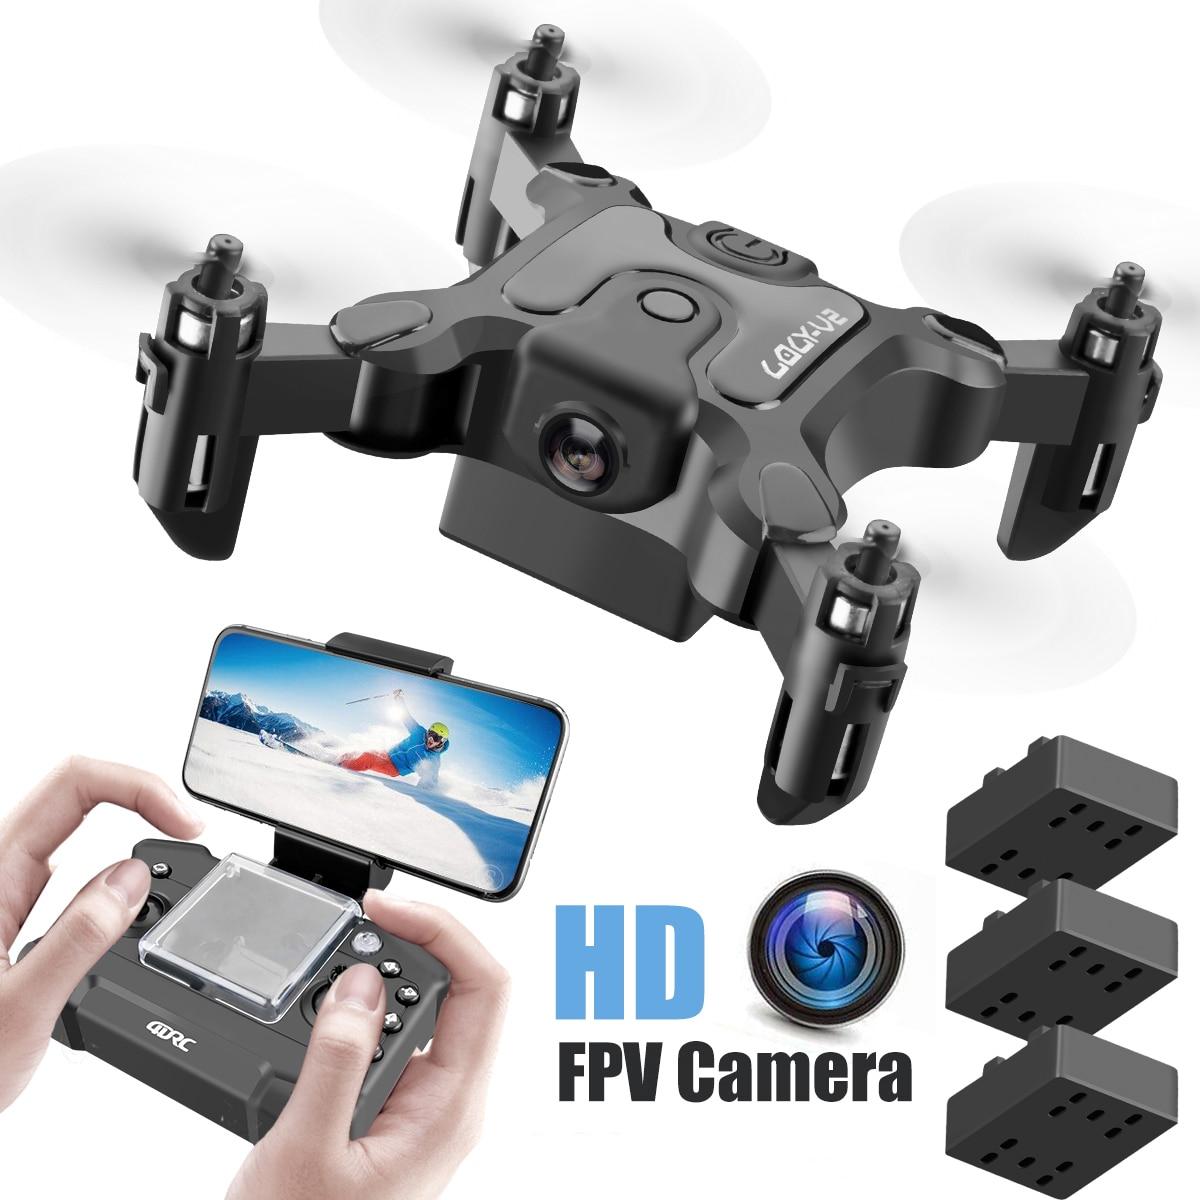 New Mini Drone V2 1080P HD Camera WiFi Fpv Air Pressure Altitude Hold Foldable Quadcopter RC Drone Kid Toy GIft